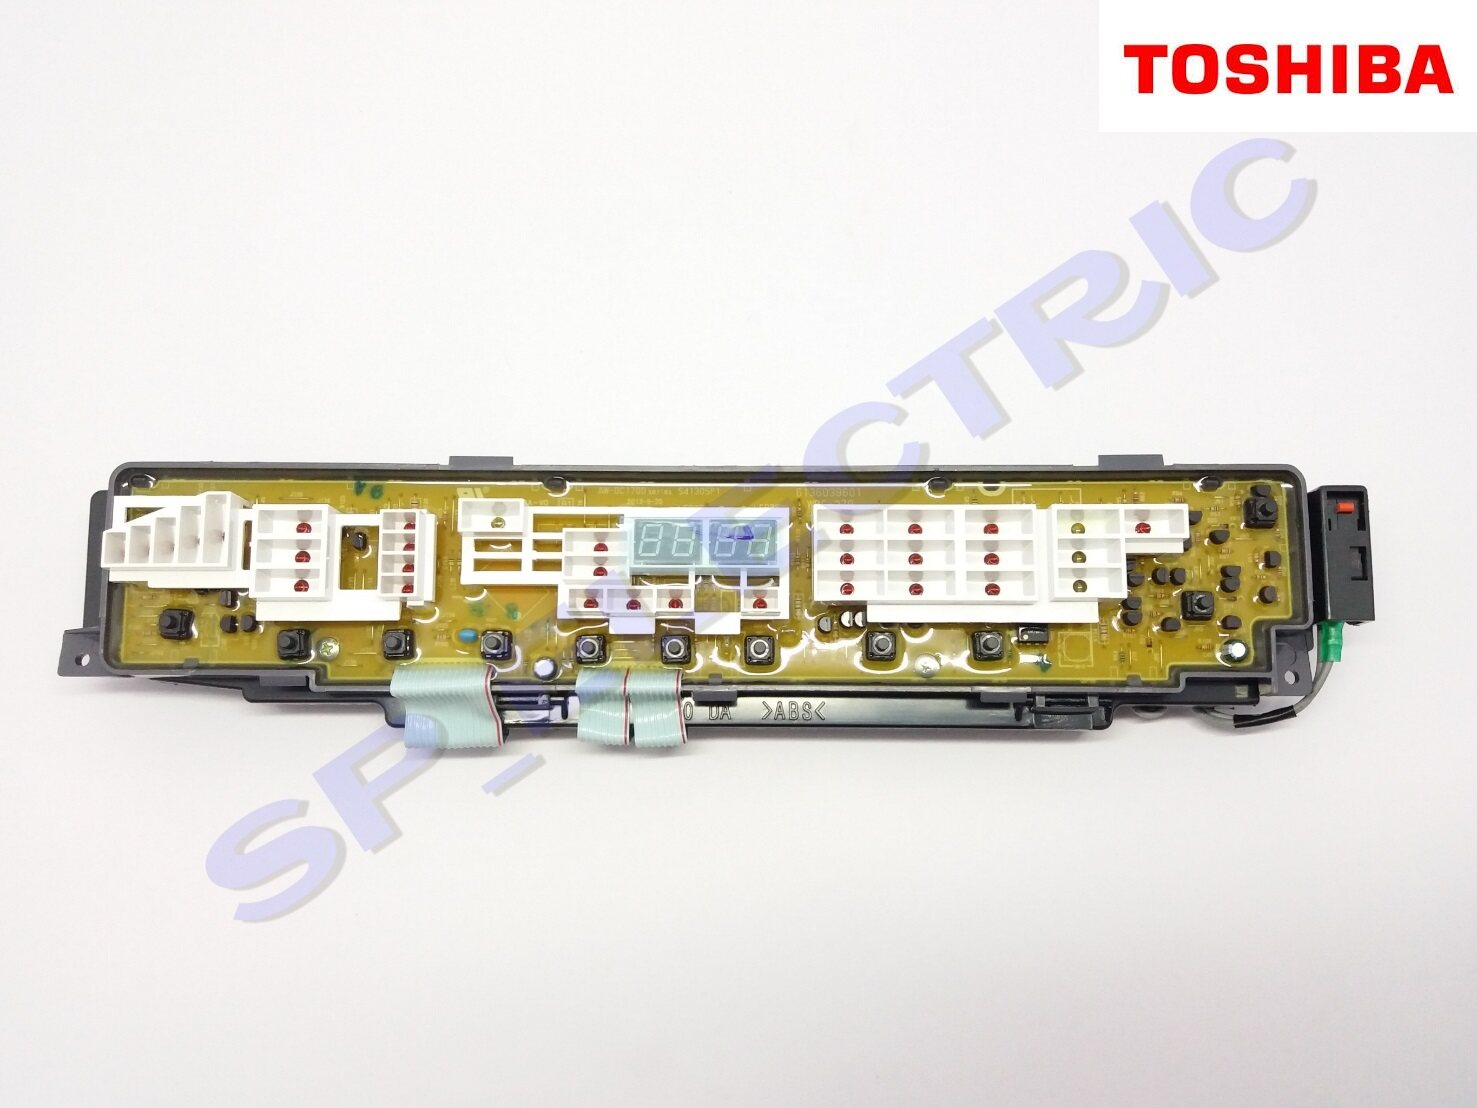 AW-DC13/15/17 แผง PCB เครื่องซักผ้า Toshiba แท้ รุ่นAW-DC1300WT AW-DC1500WT AW-DC1700WT